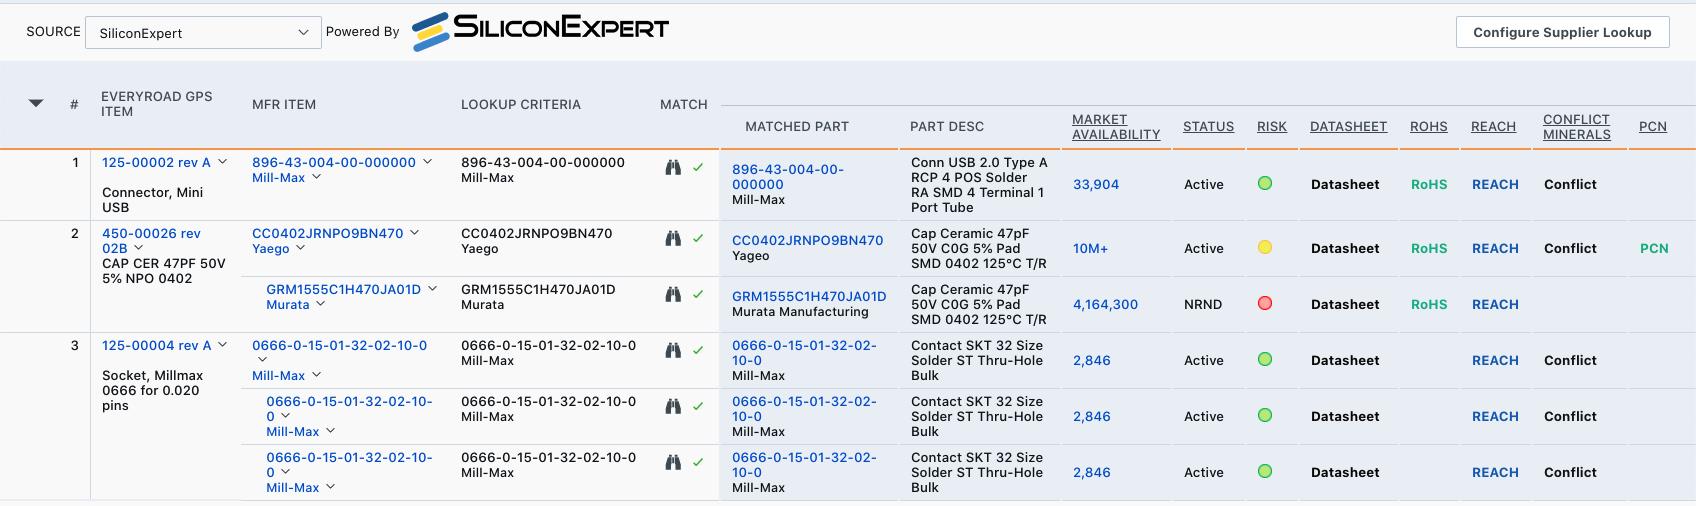 Arena SiliconExpert Screenshot